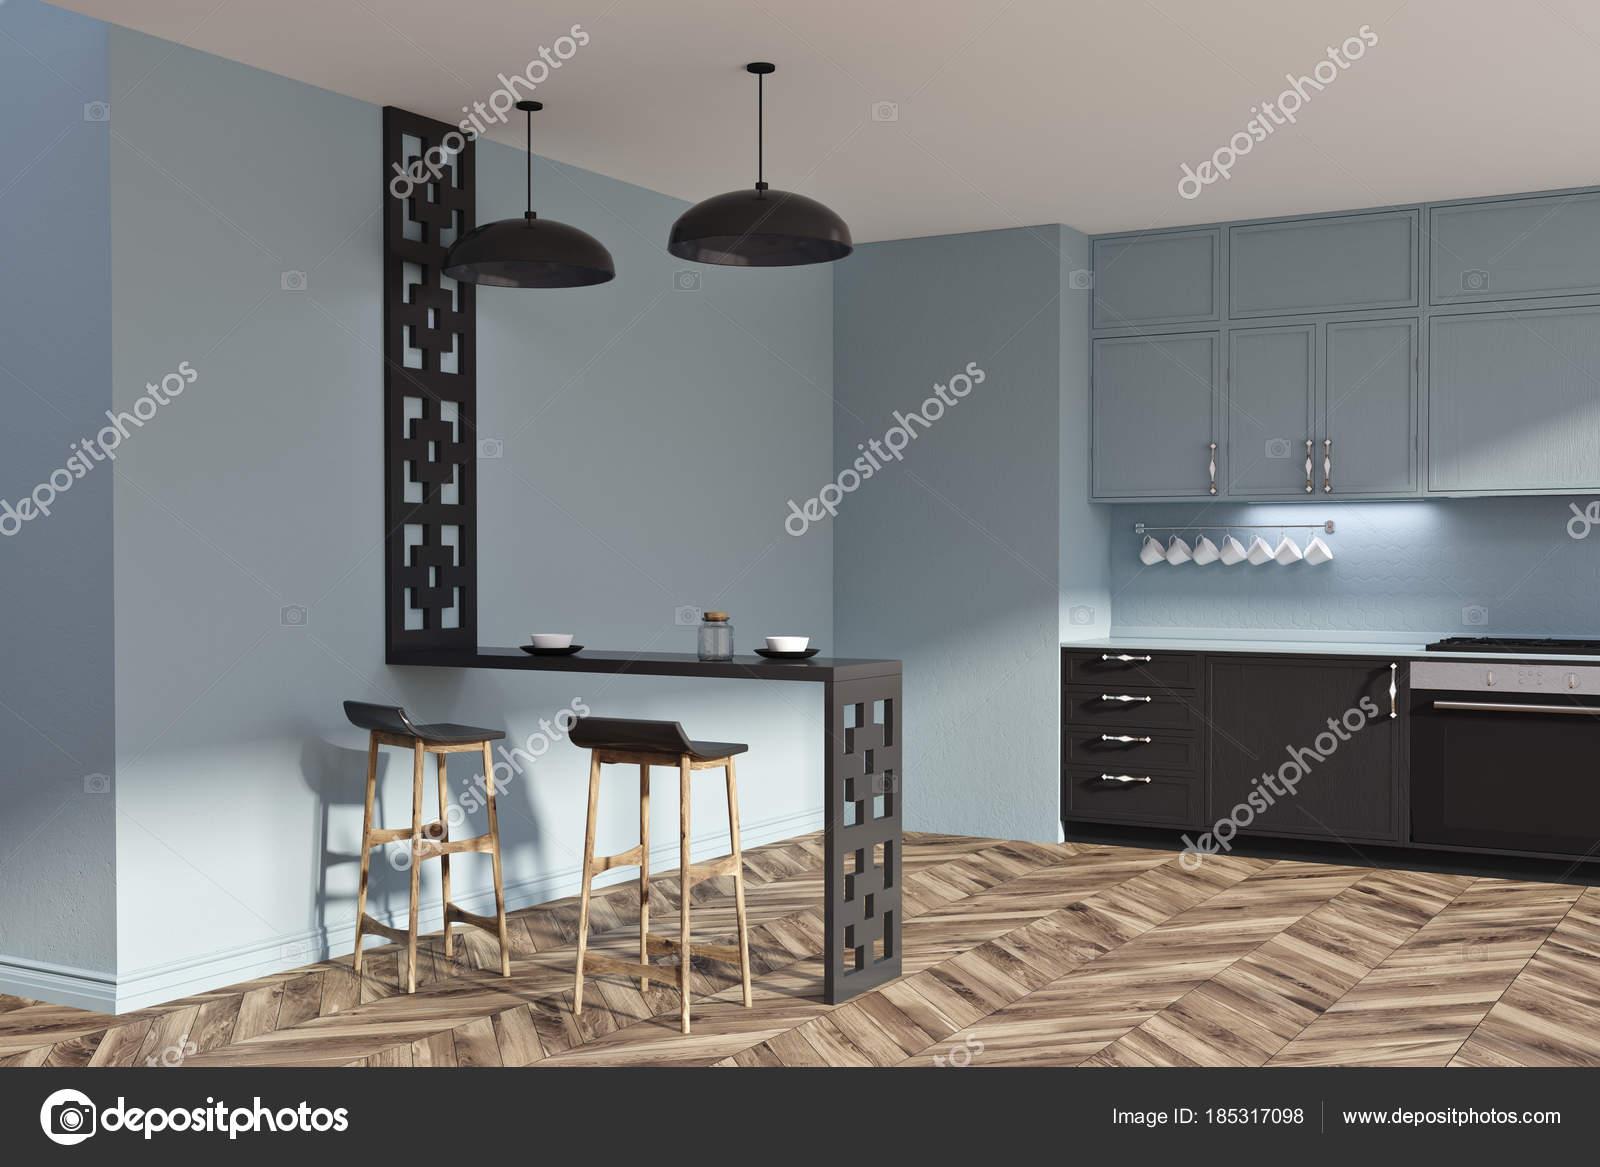 Zwarte Keuken Ideeen : Grijze en zwarte originele keuken idee kant u2014 stockfoto